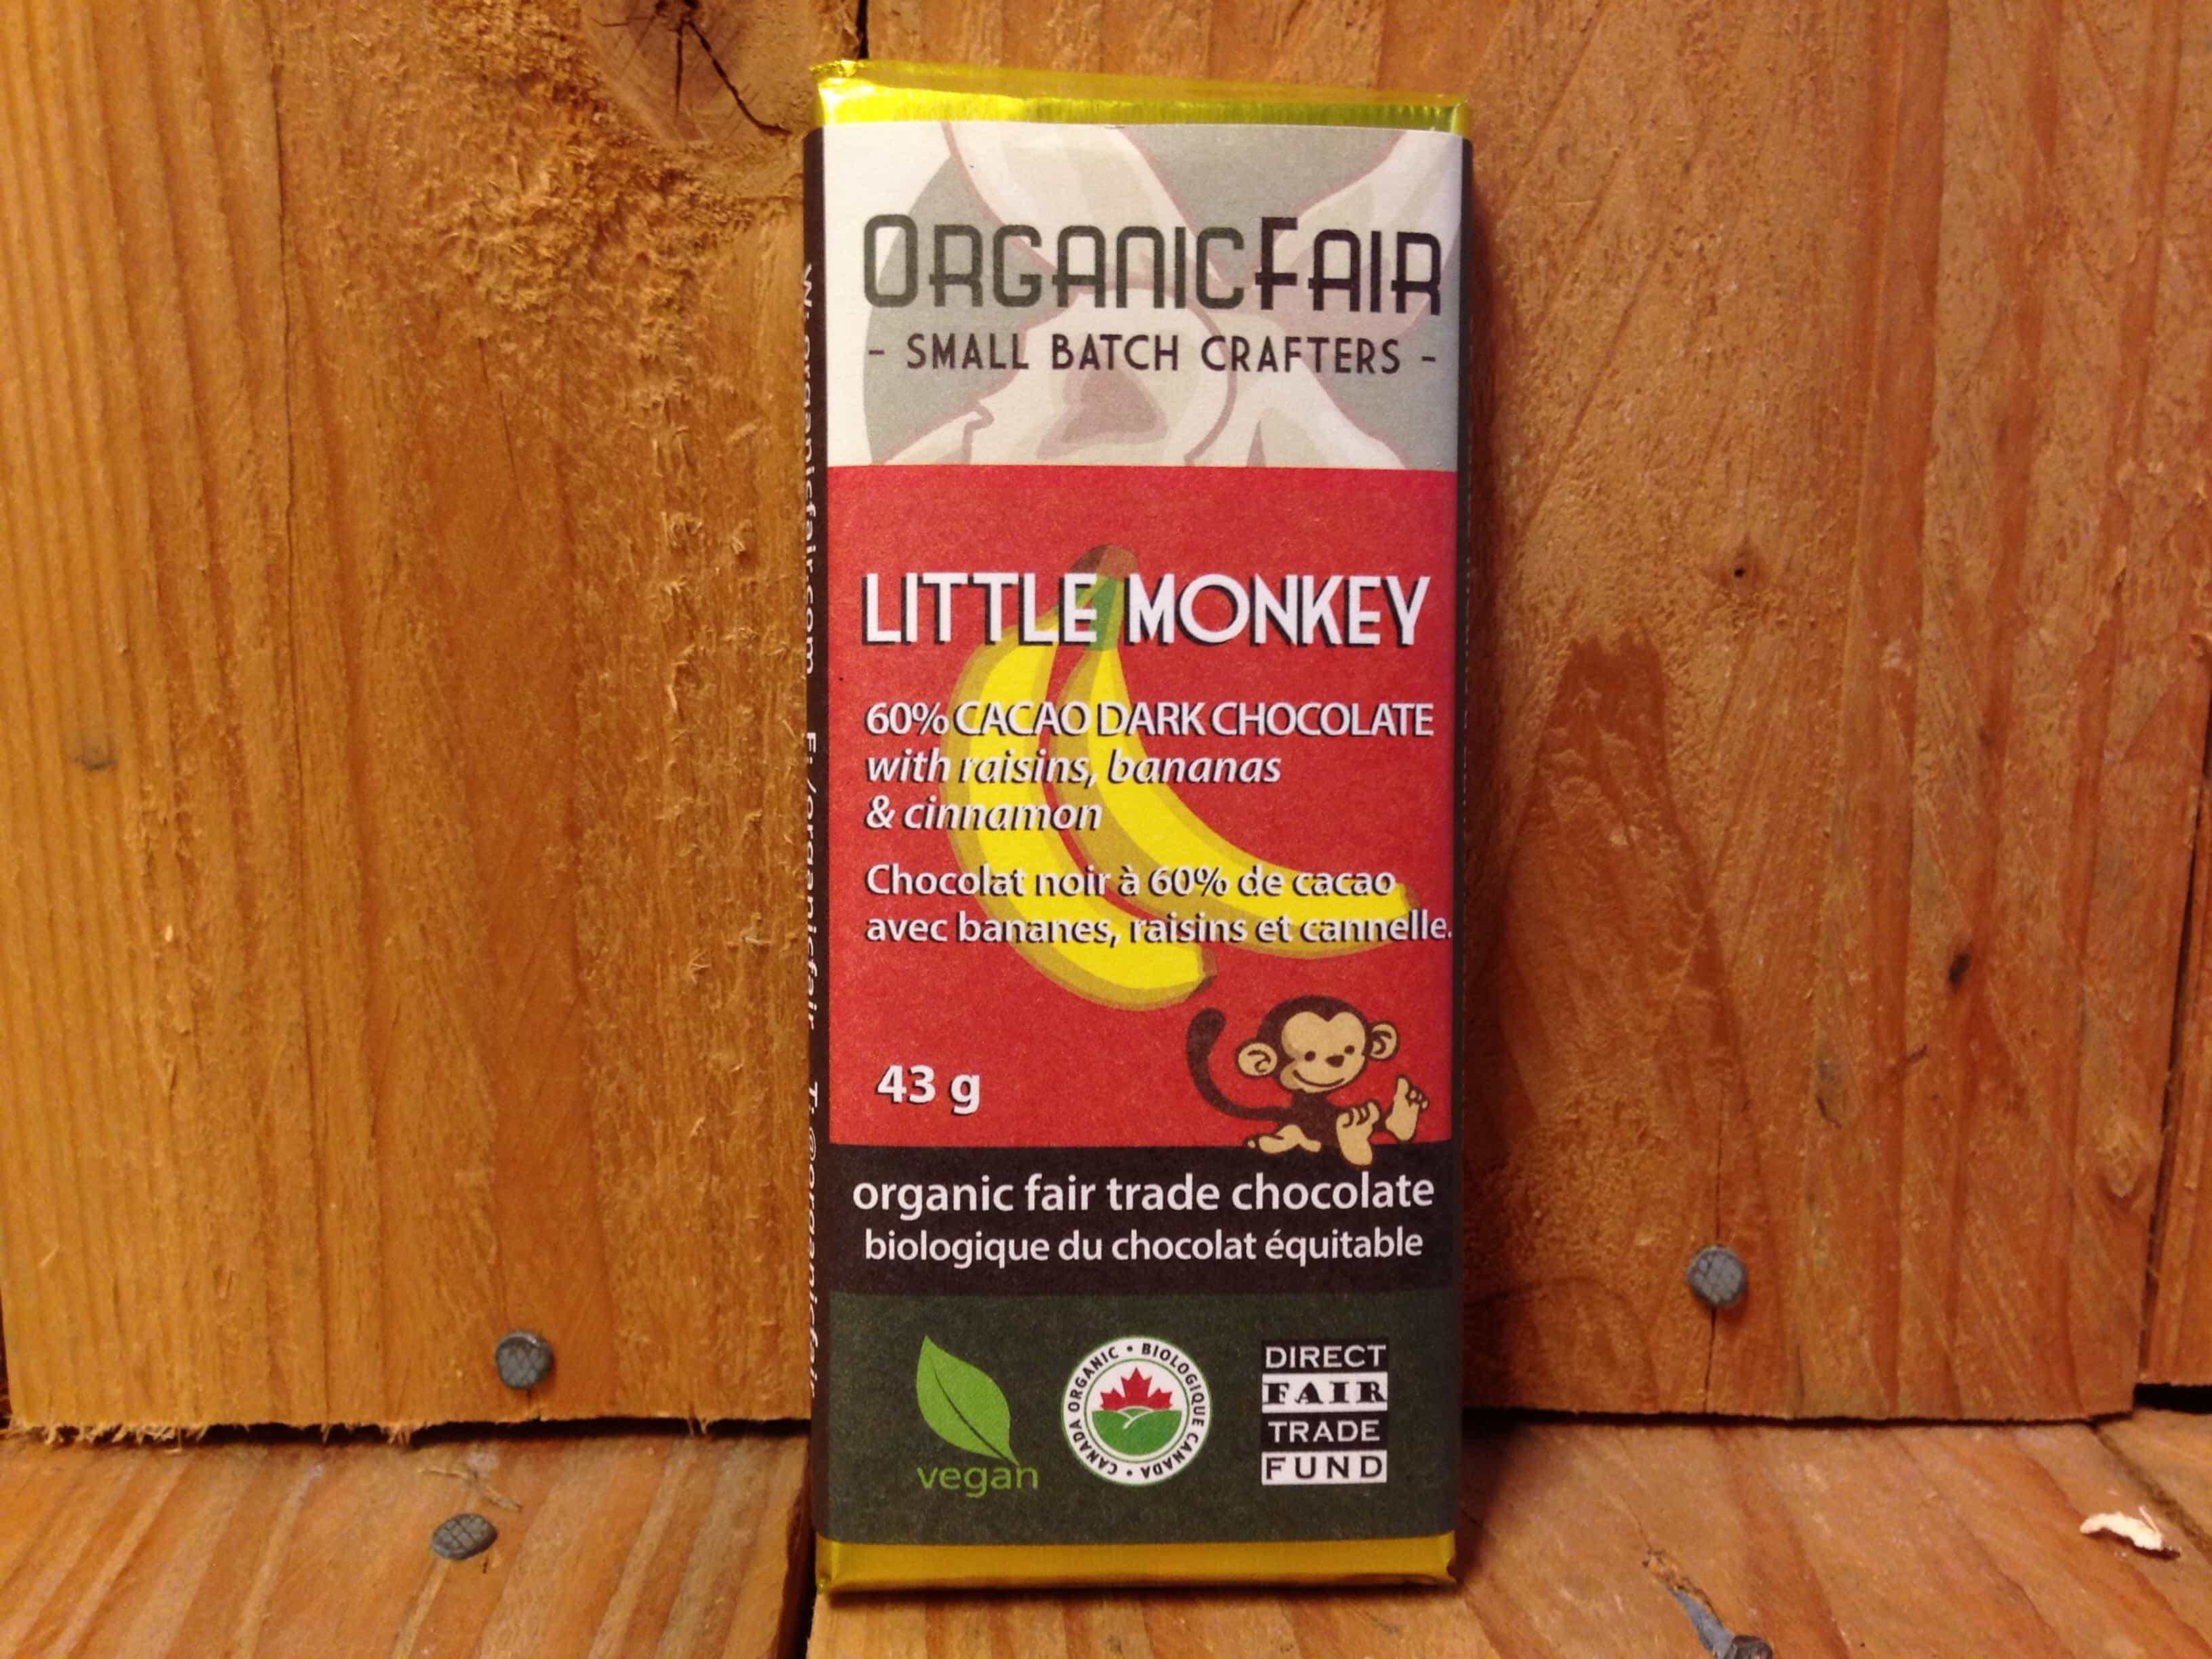 Organic Fair – Chocolate – Little Monkey (43g)